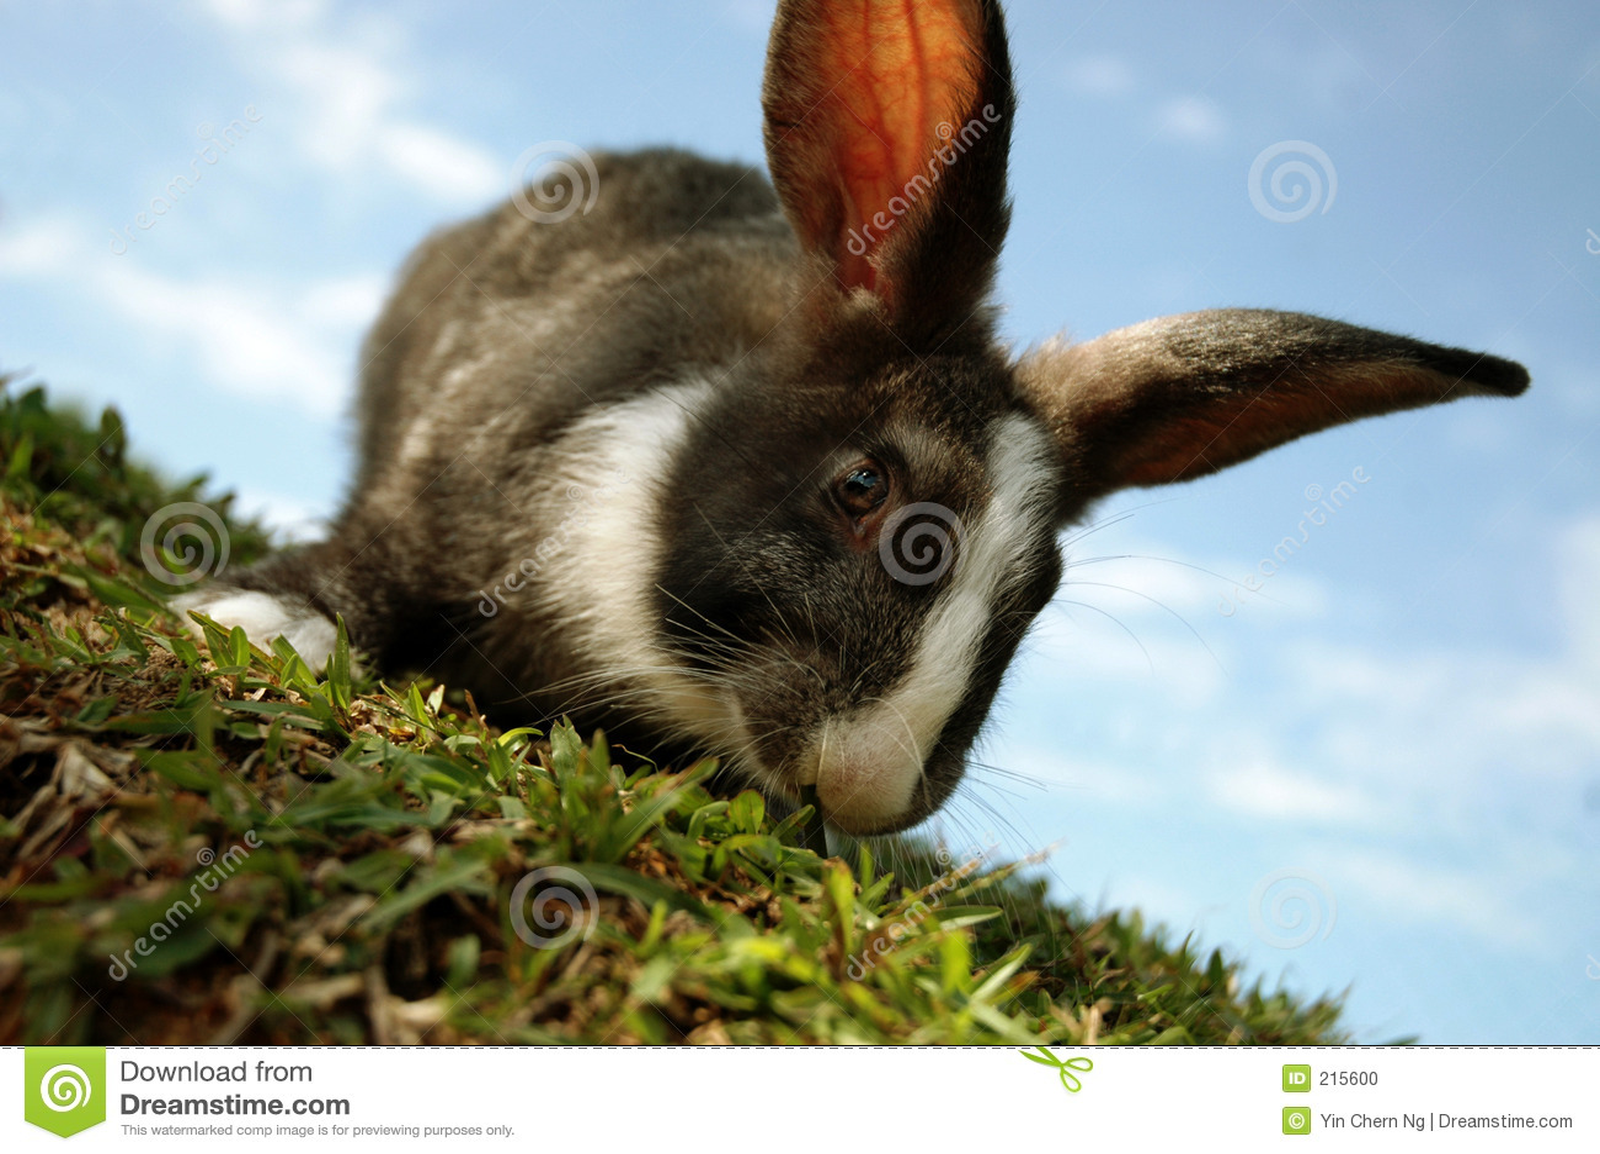 Bunny hill